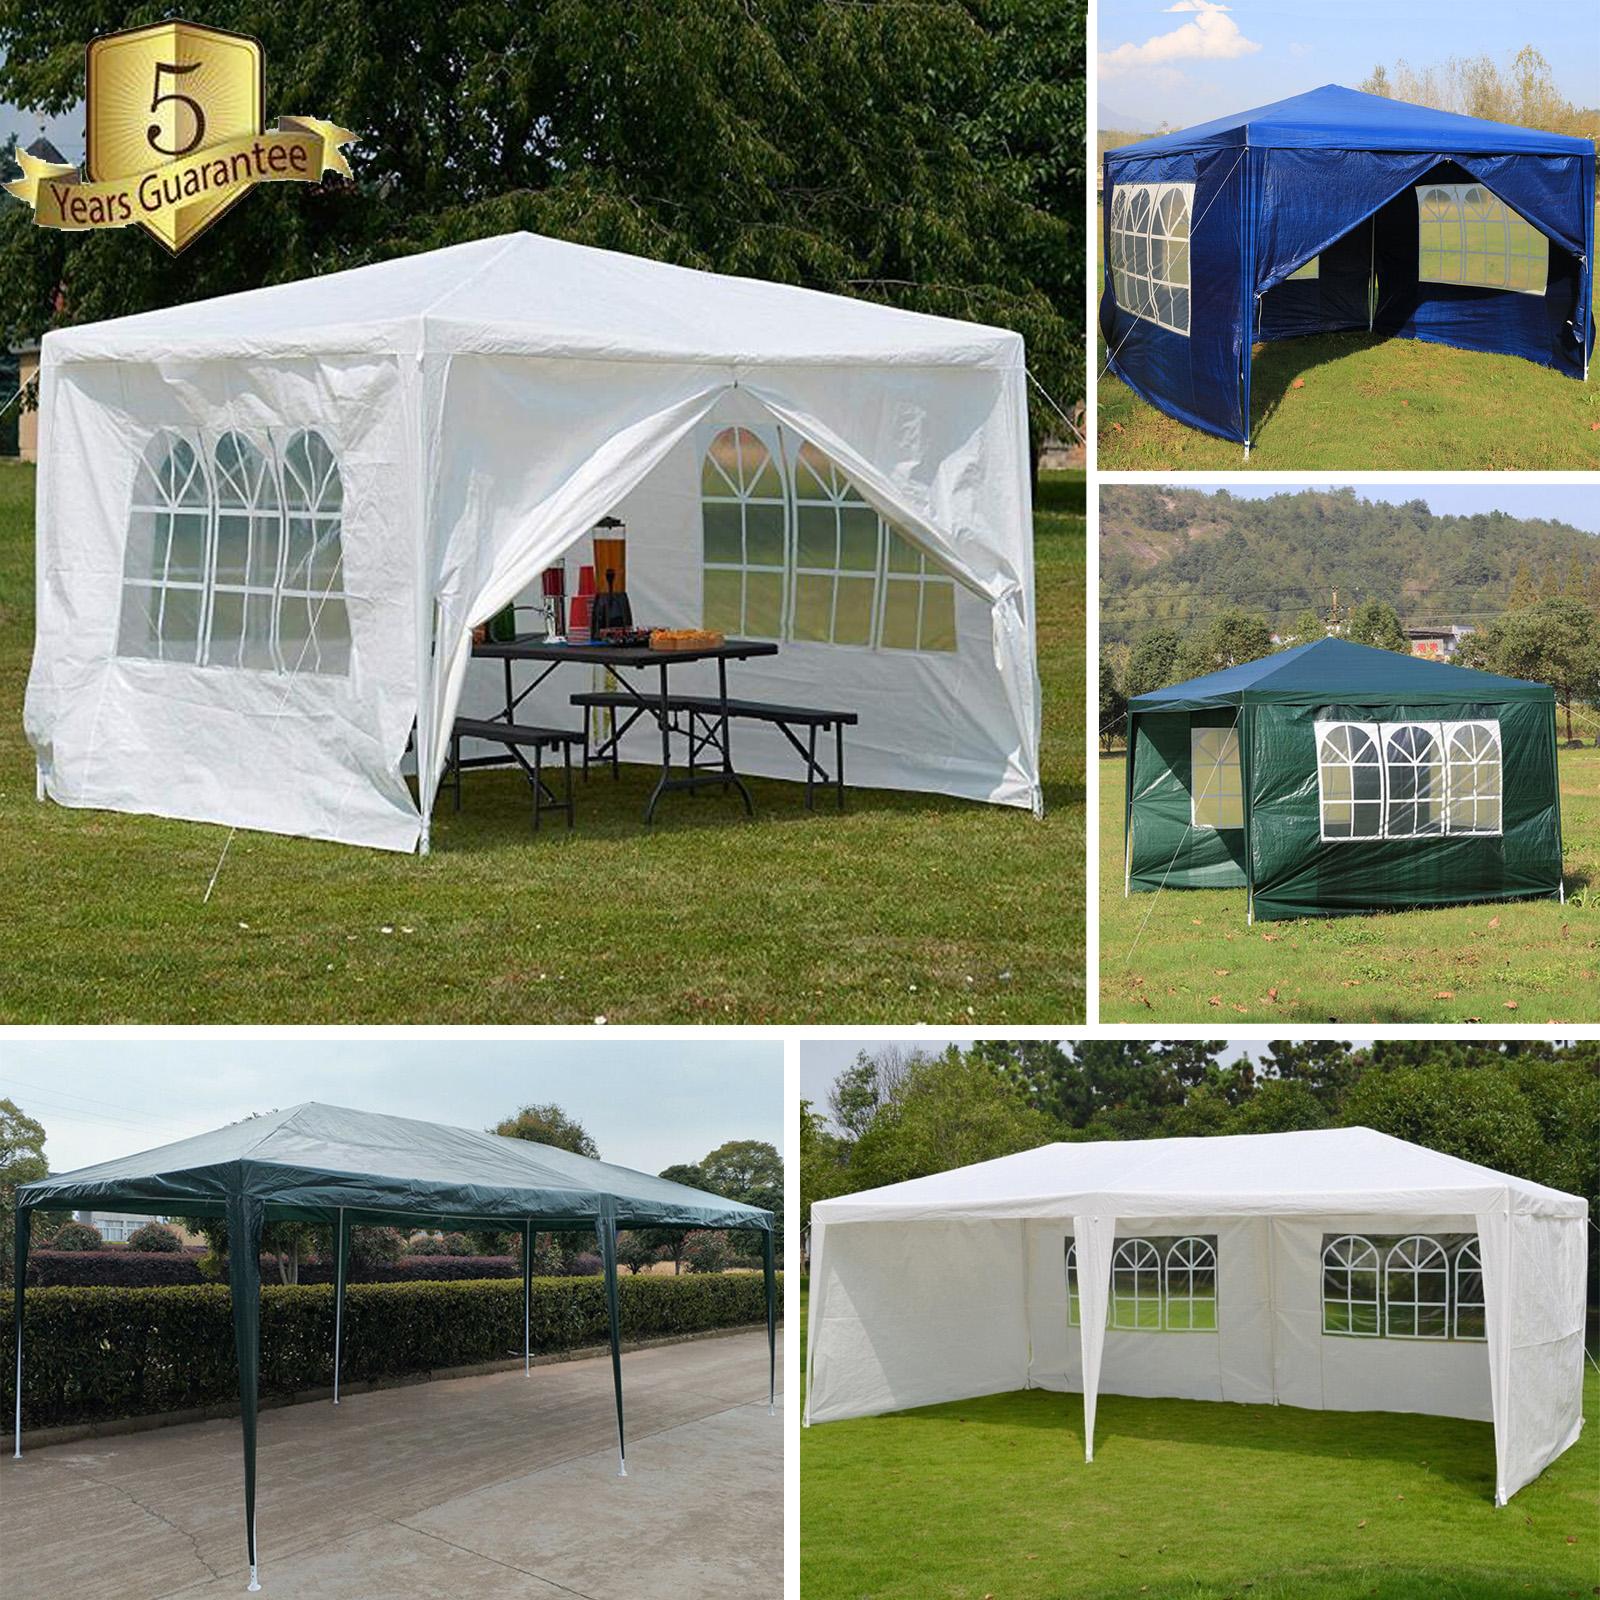 3x3m Gazebo Waterproof Garden Outdoor Marquee Wedding Party Tent Heavy Duty